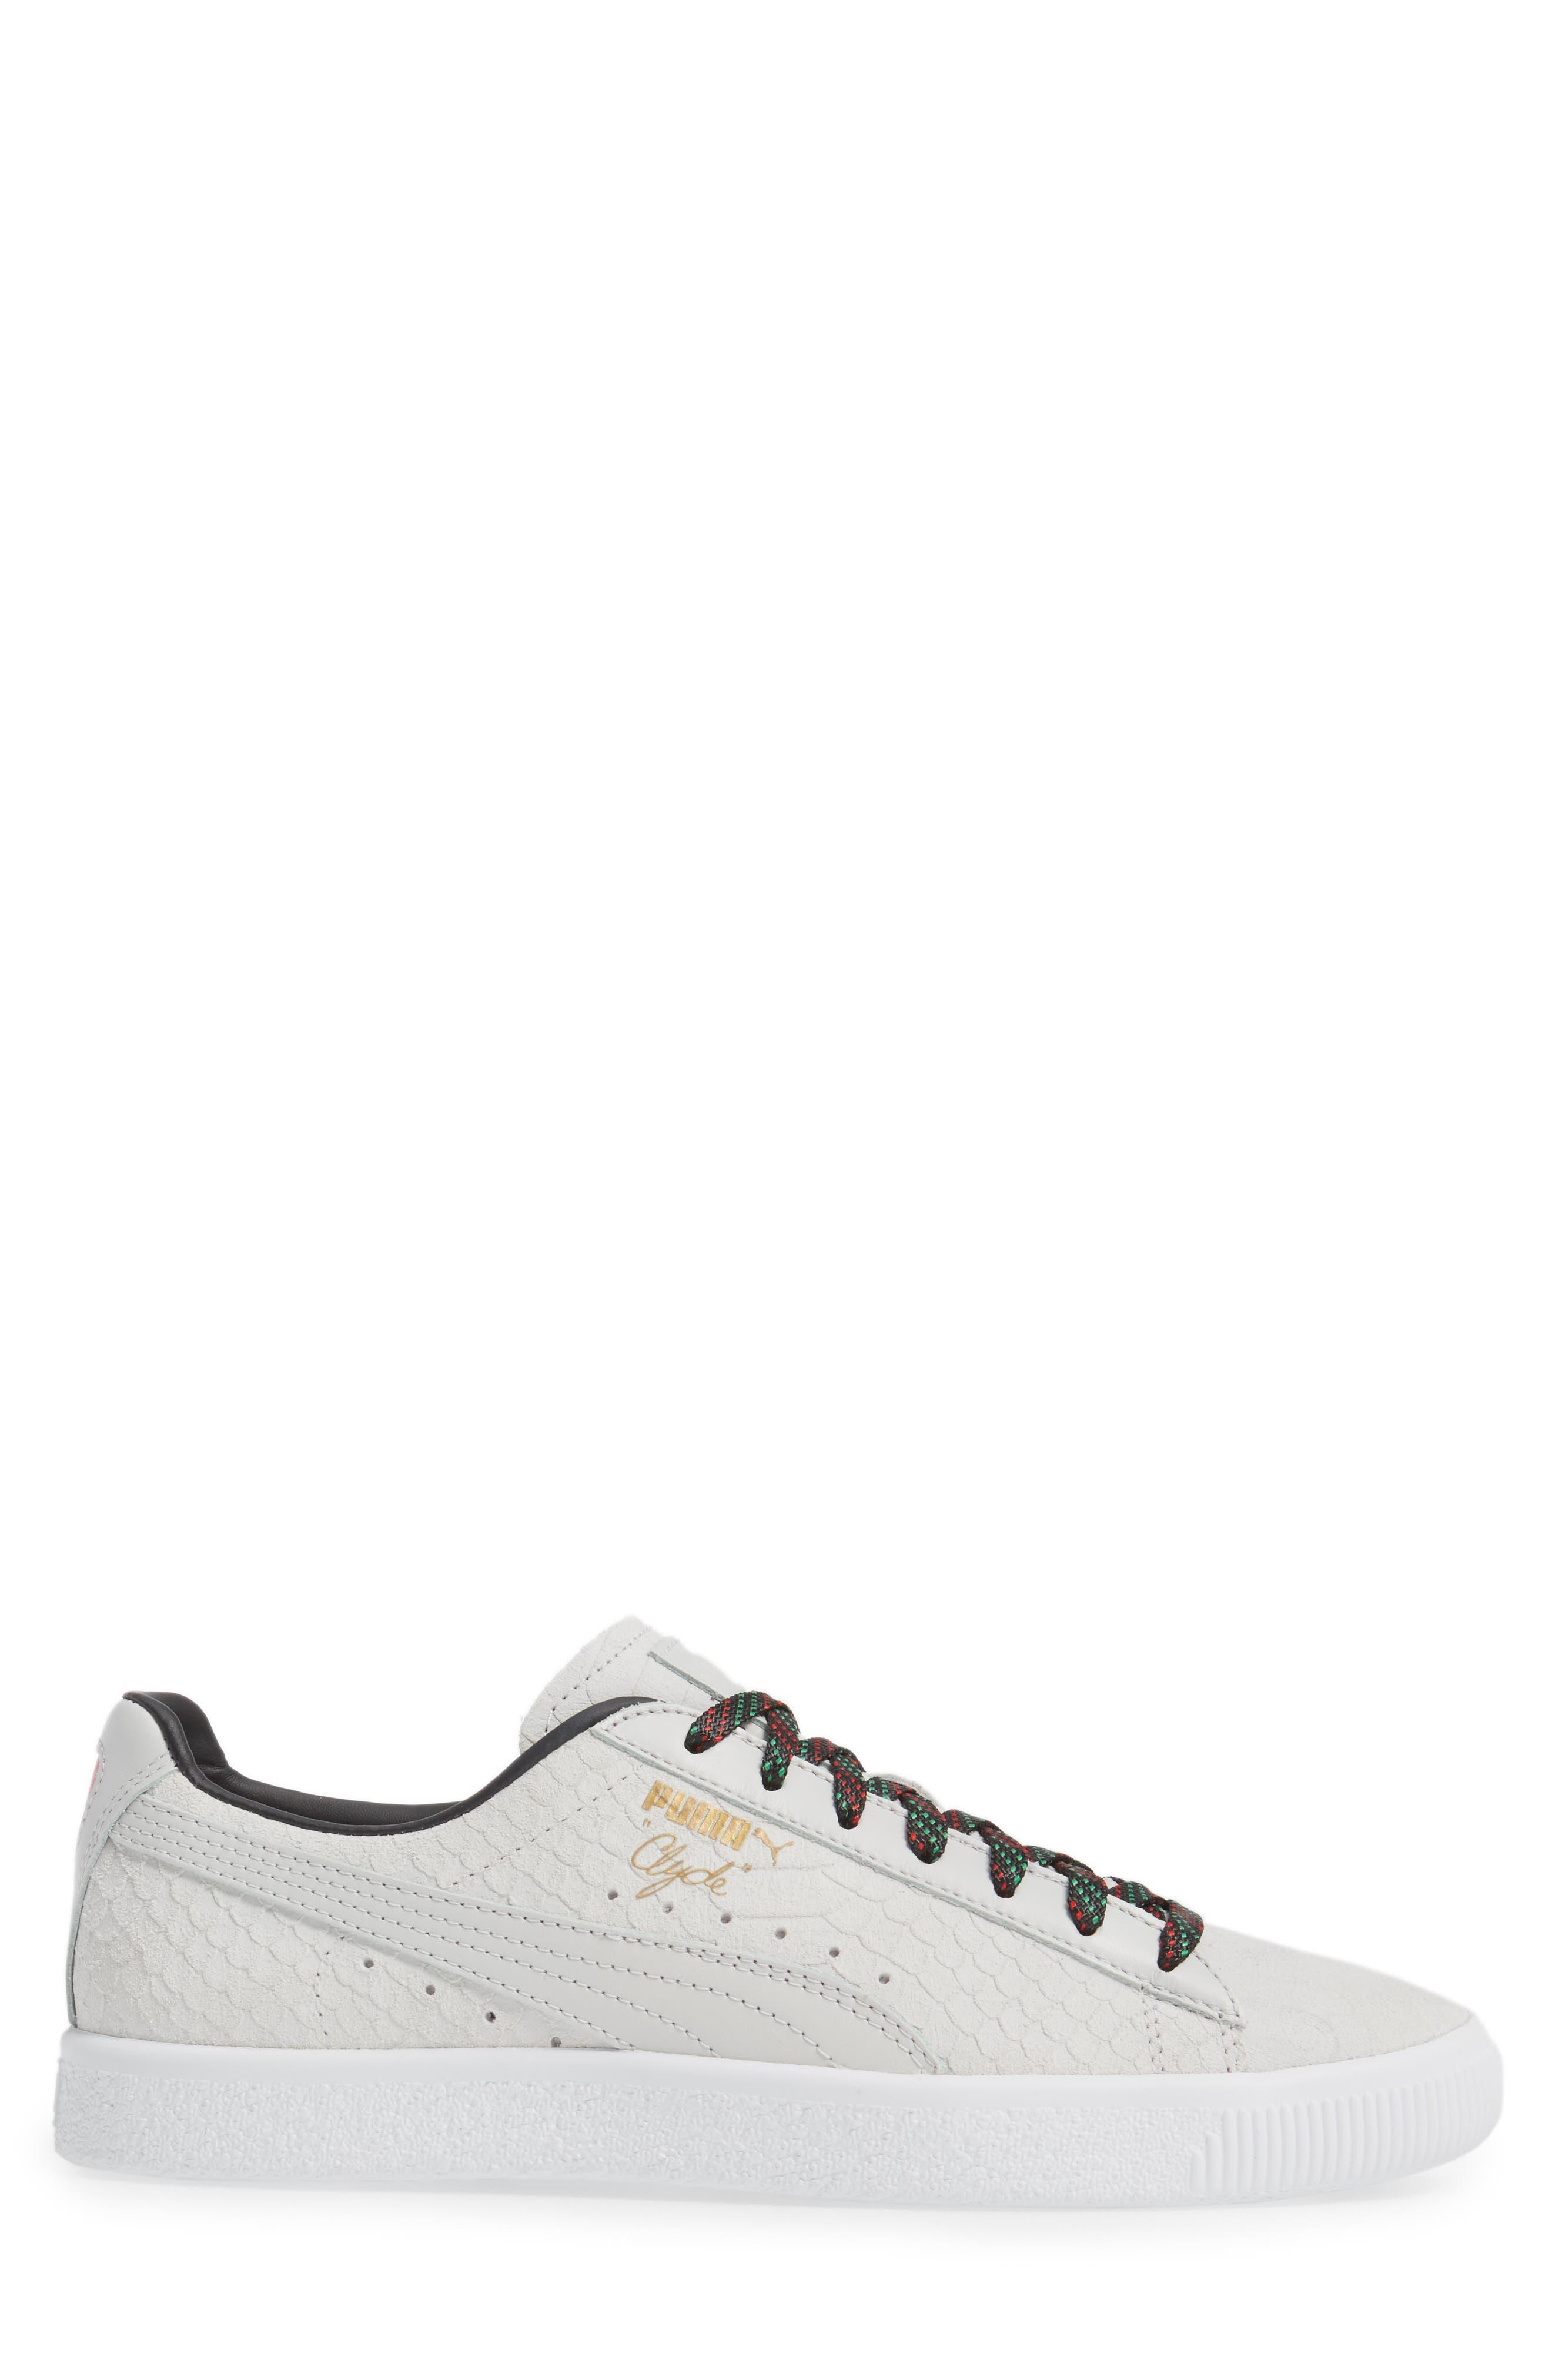 Clyde GCC Sneaker,                             Alternate thumbnail 3, color,                             White/ Puma Black